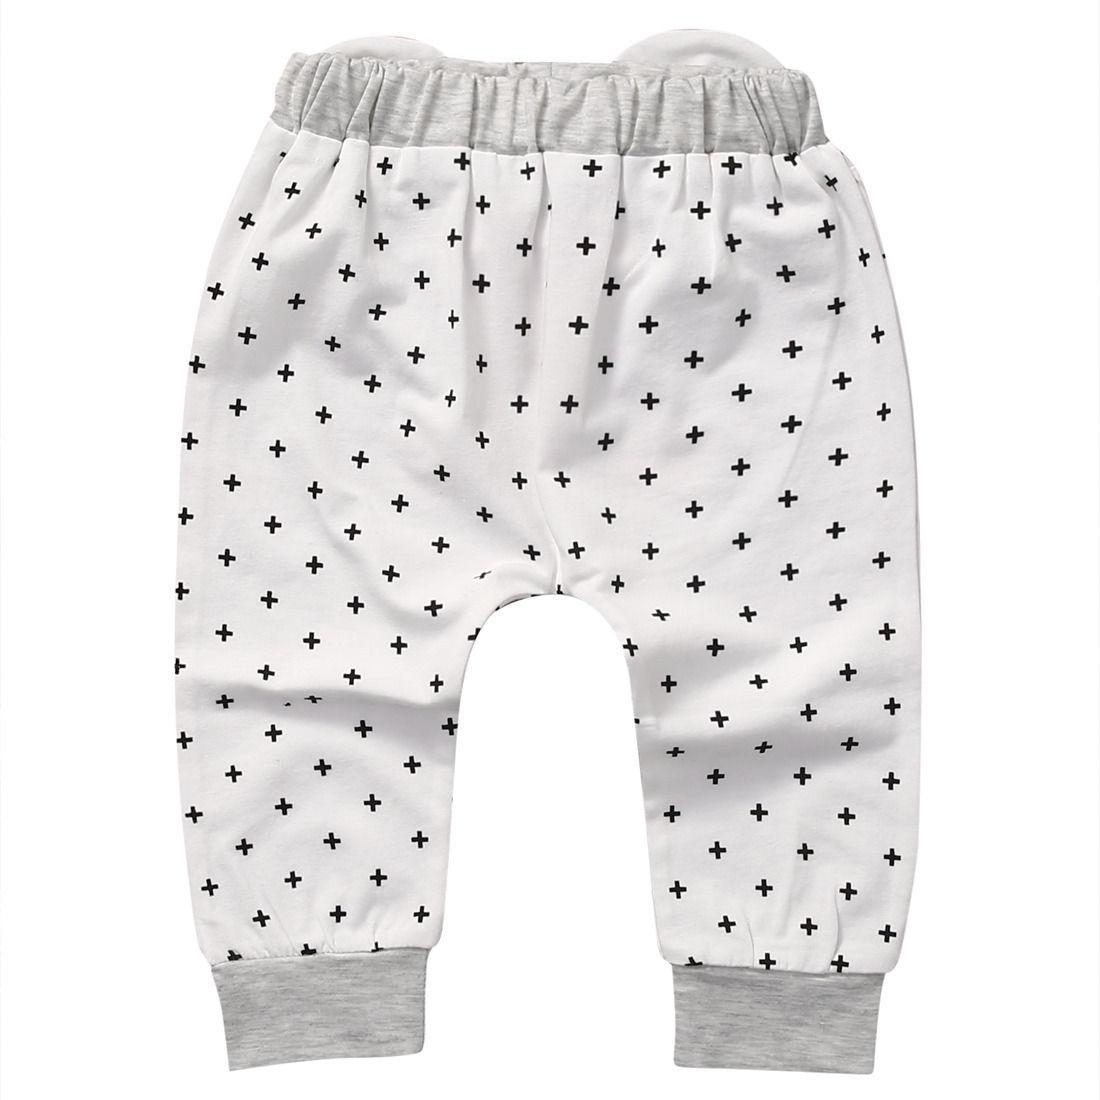 Infant Kids Cartoon Newborn Baby Boys Girls Harem Pants Bottoms Leggings Trousers Pants 0-2T Child Kid Boy Girl Clothing